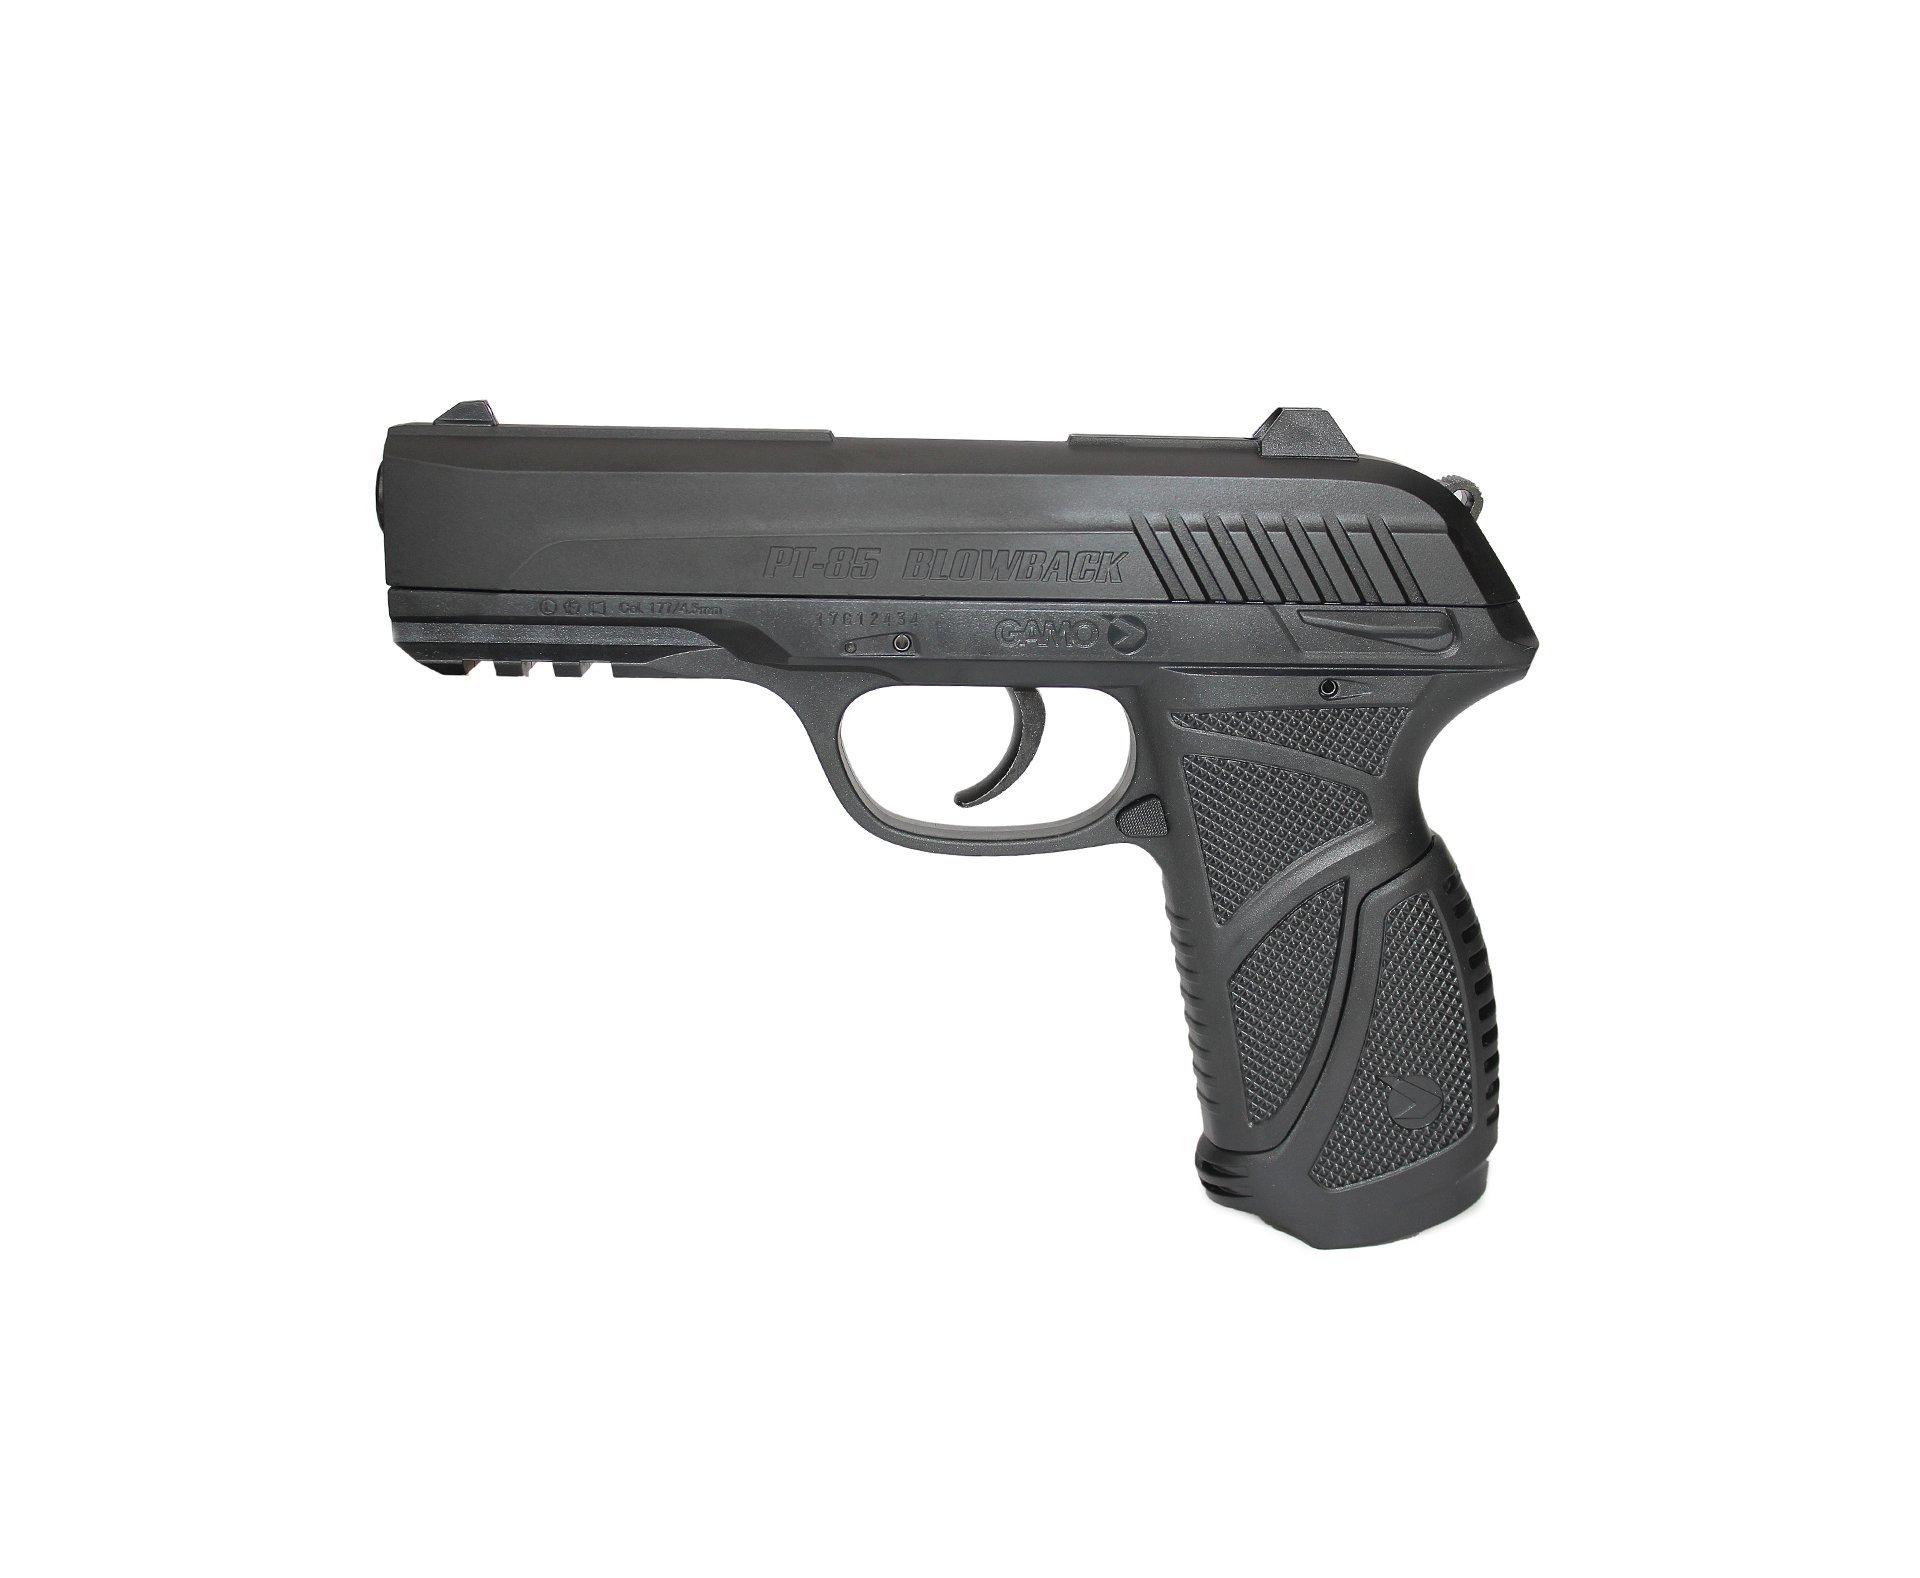 Pistola De Pressão Gamo Co2 Pt-85 Blowback Slide Metal 4.5mm